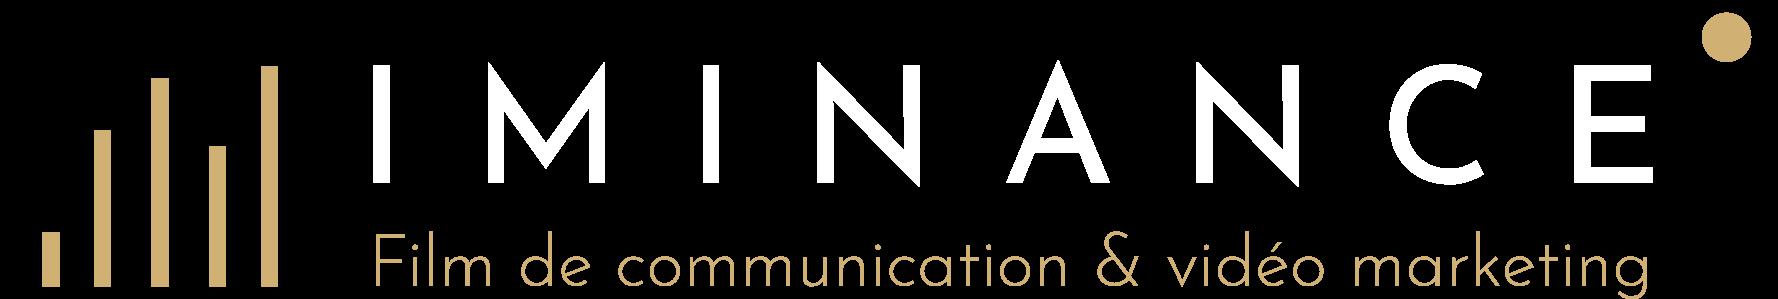 Iminance - Film de communication & vidéo marketing - Logo